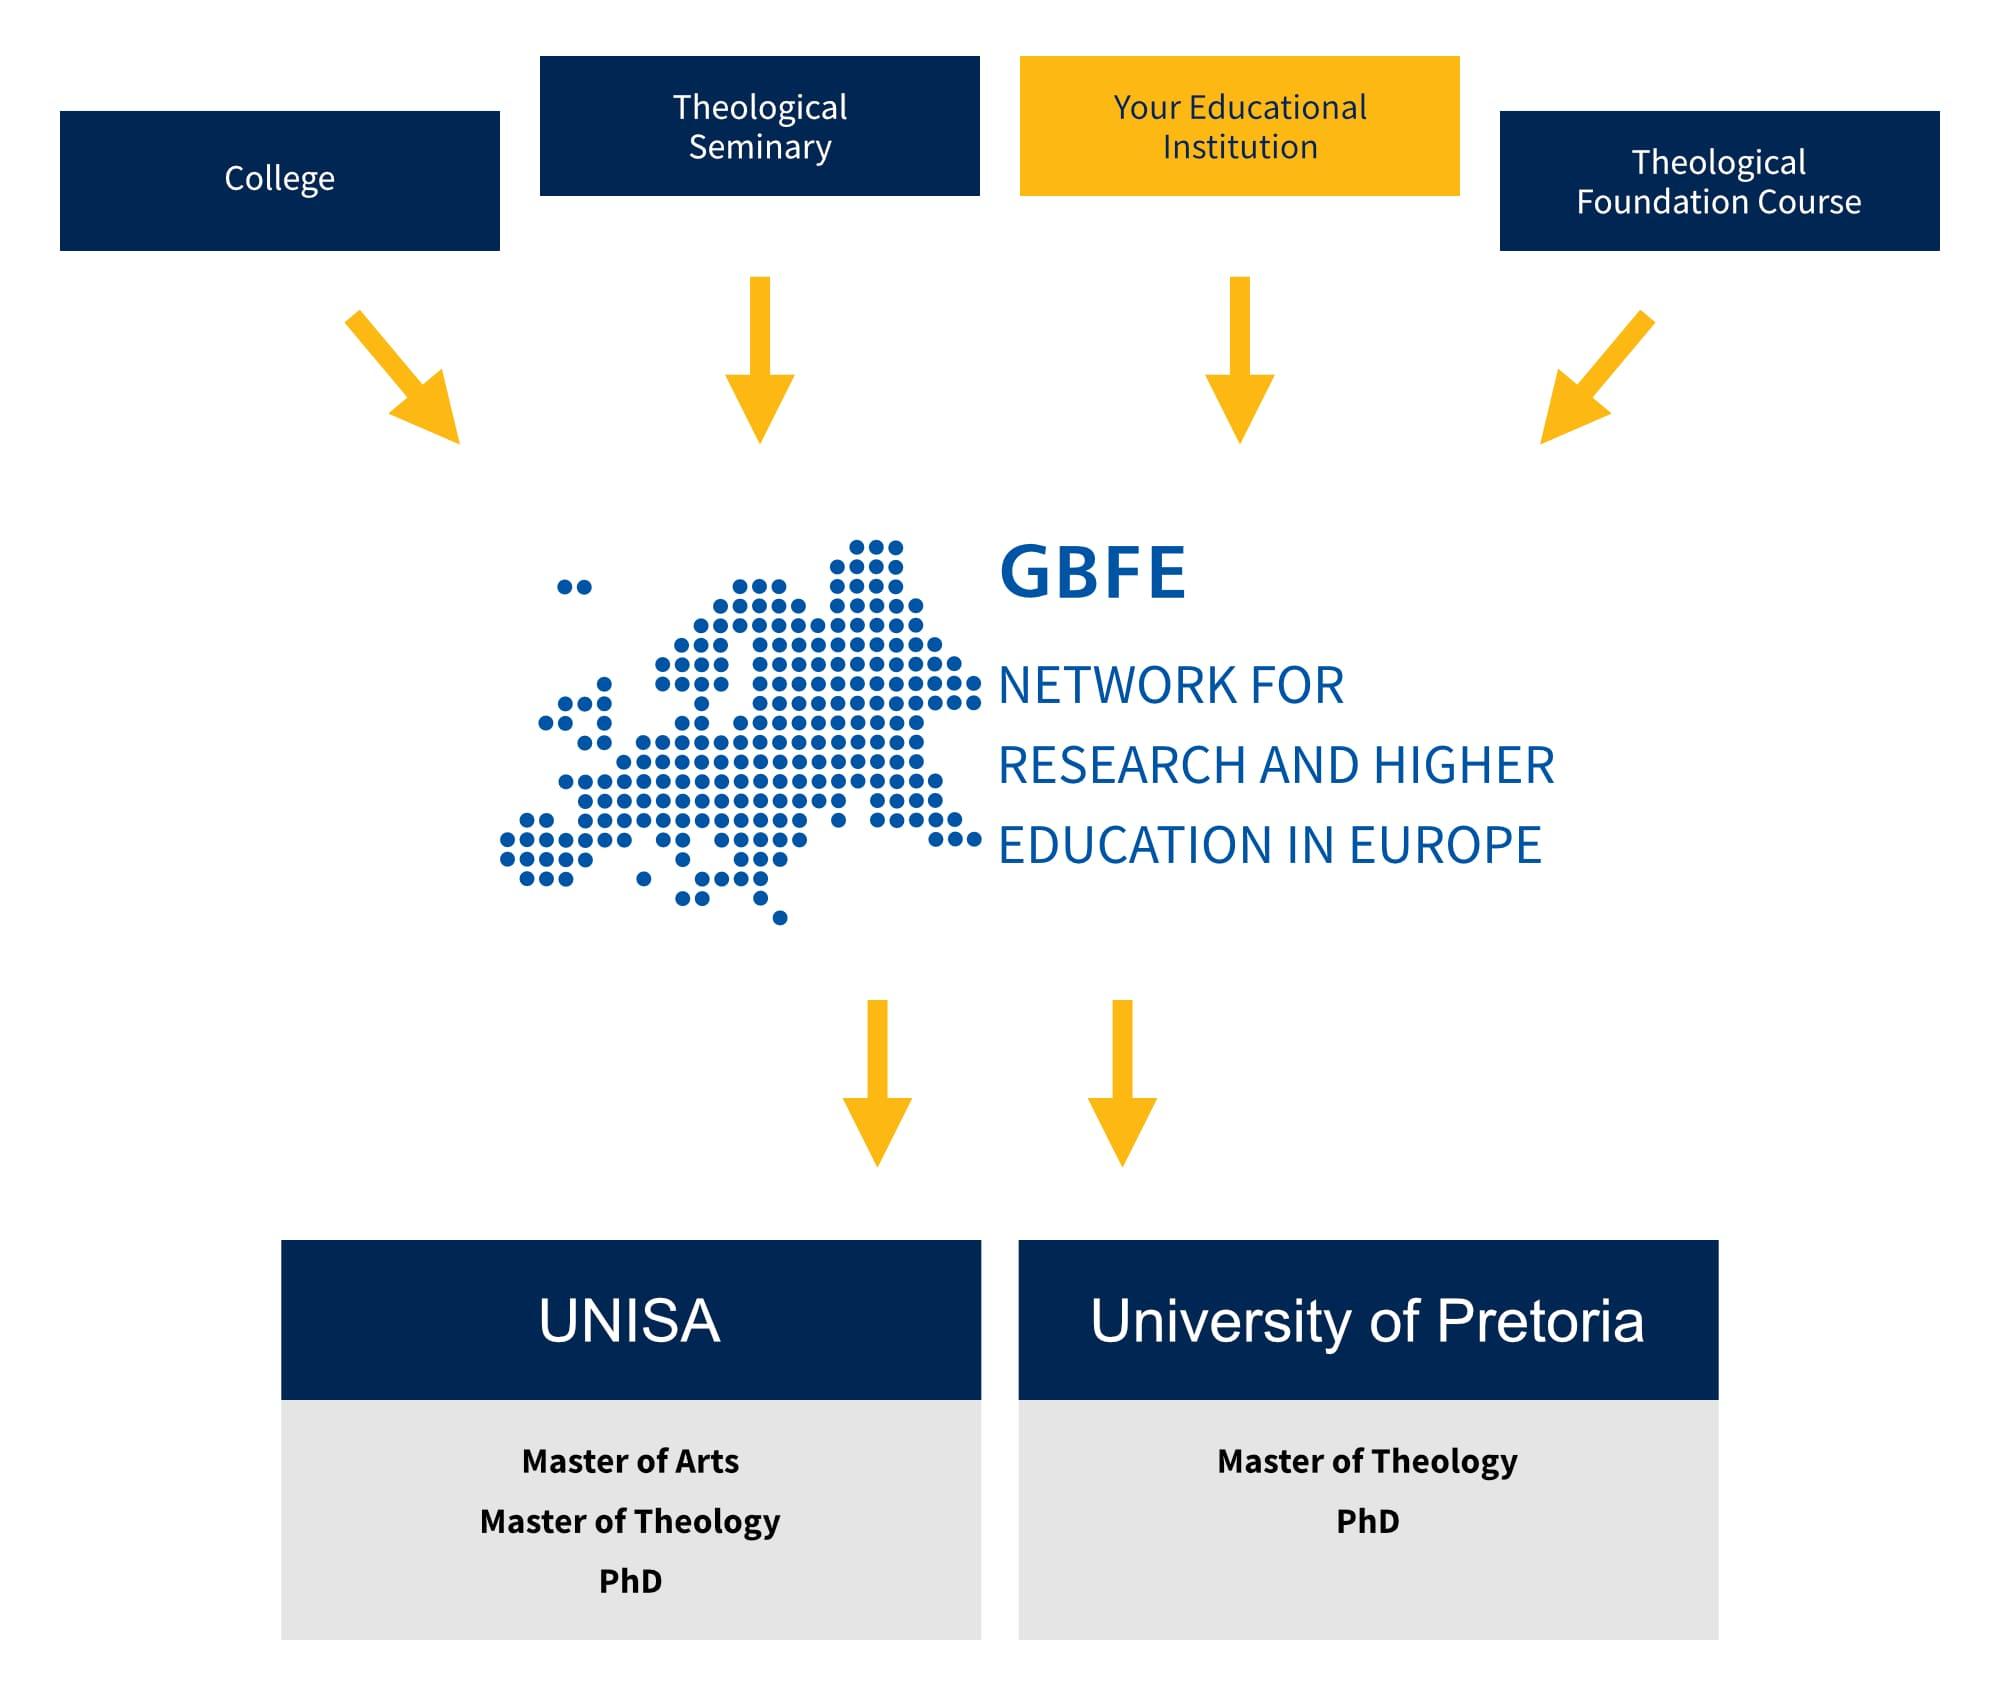 Degree program UNISA and University of Pretoria